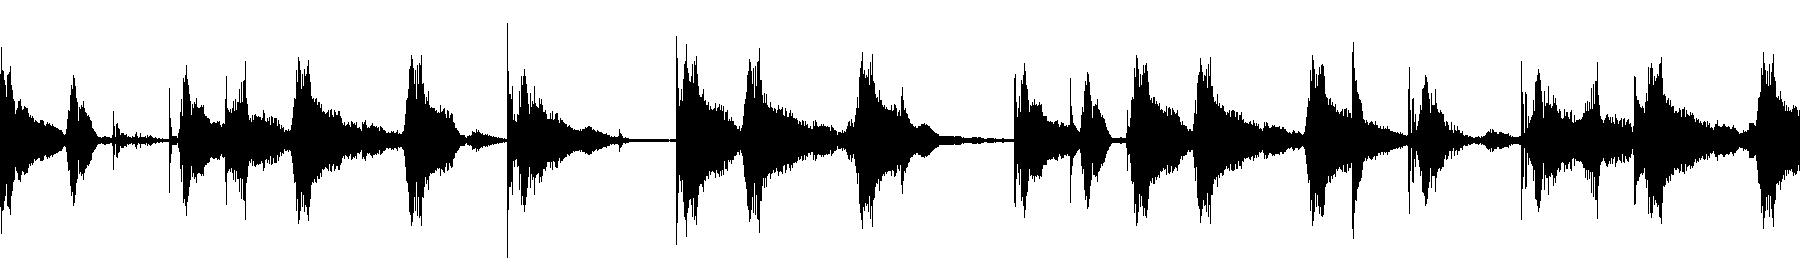 g abs05 012